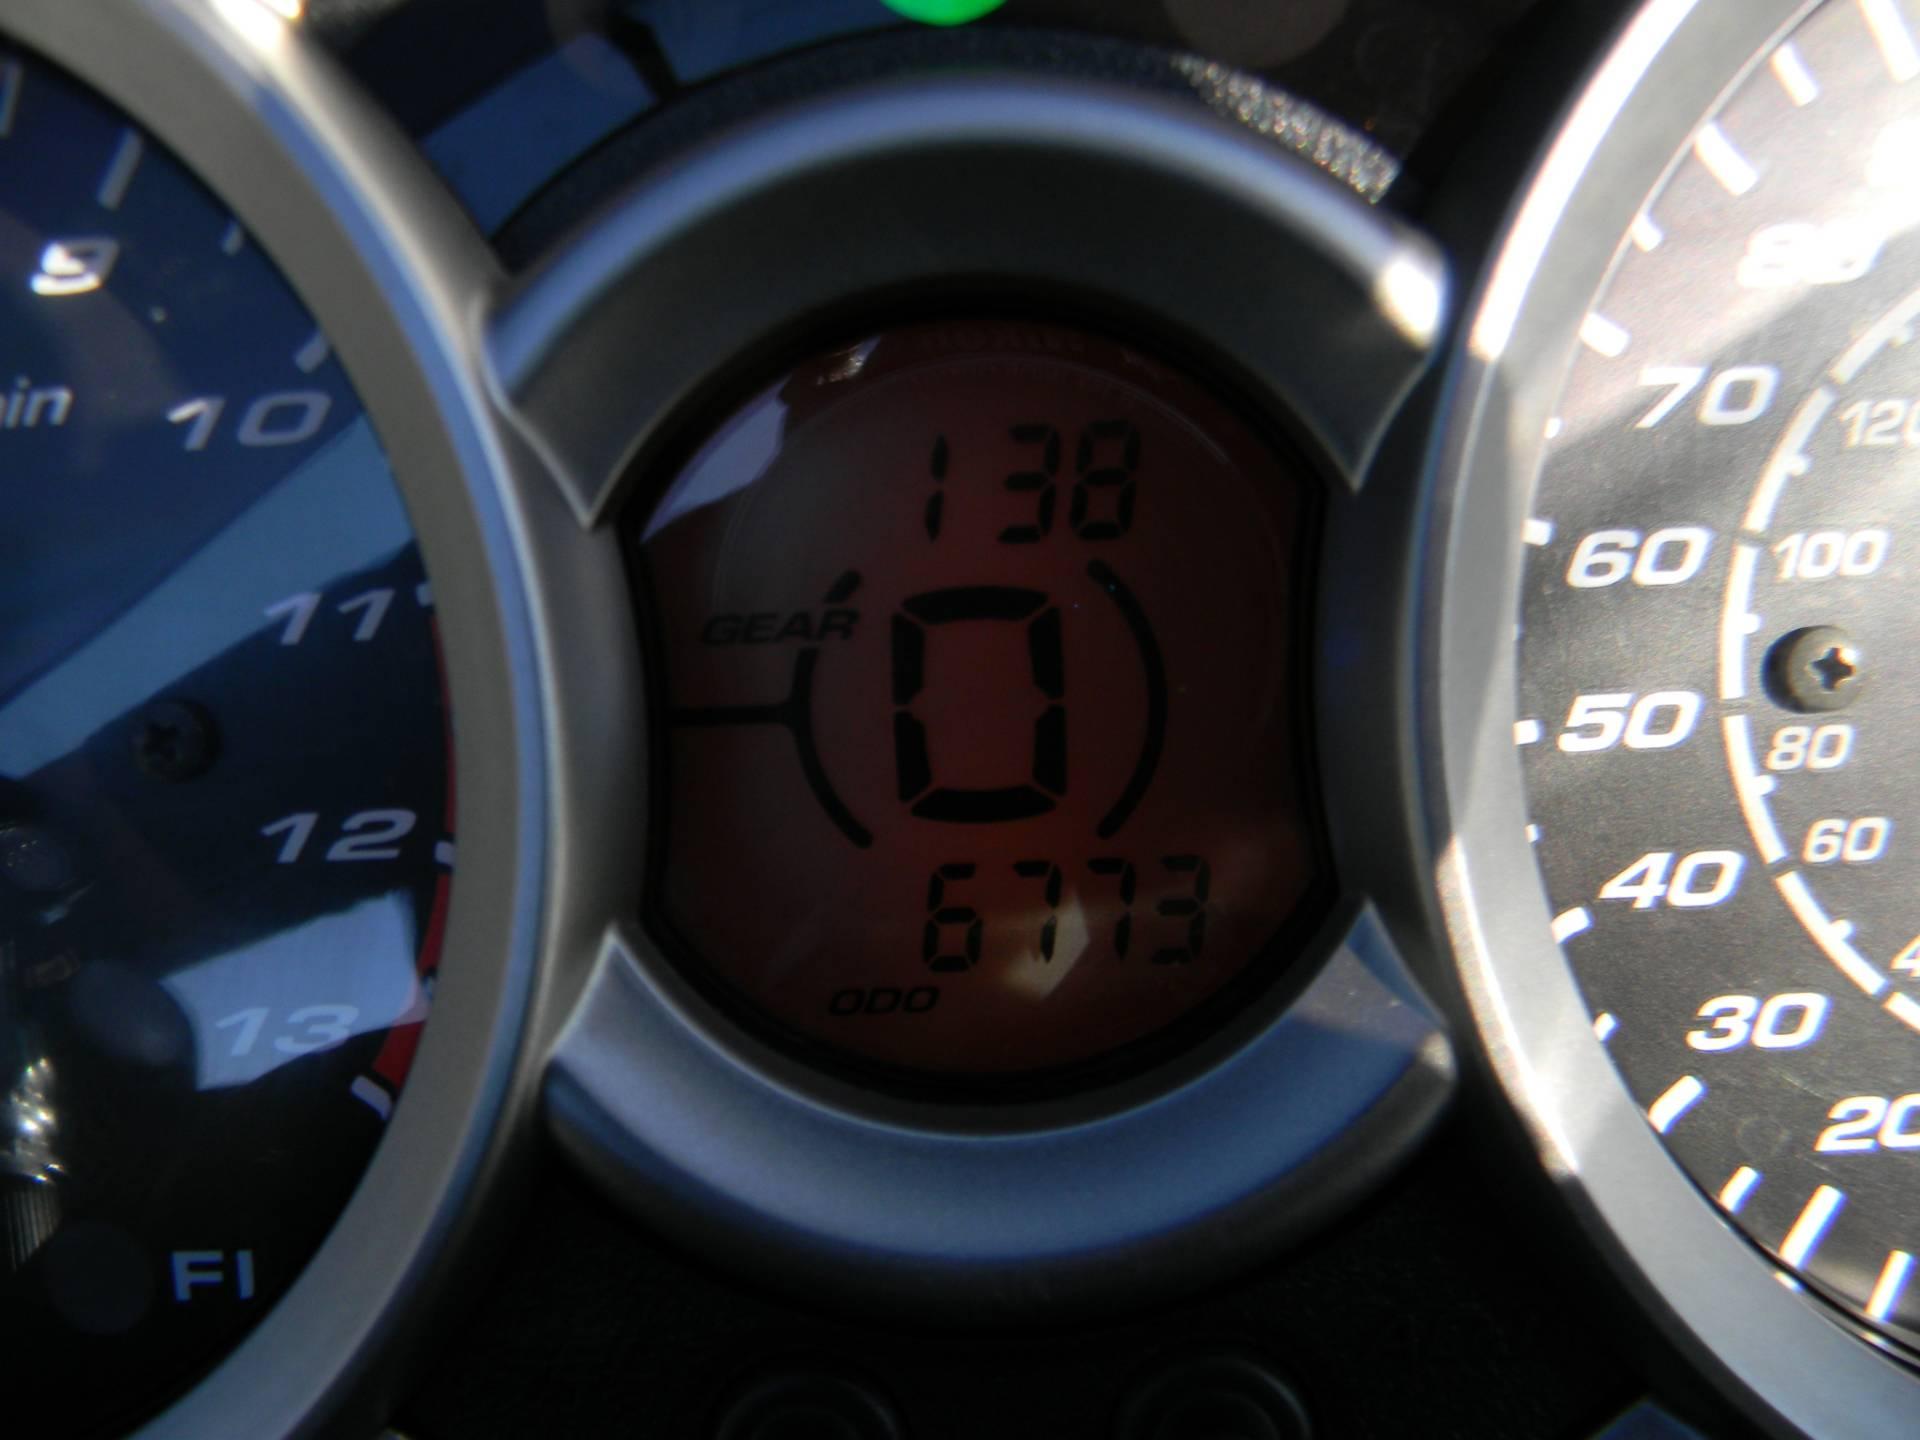 2009 Suzuki Hayabusa 4